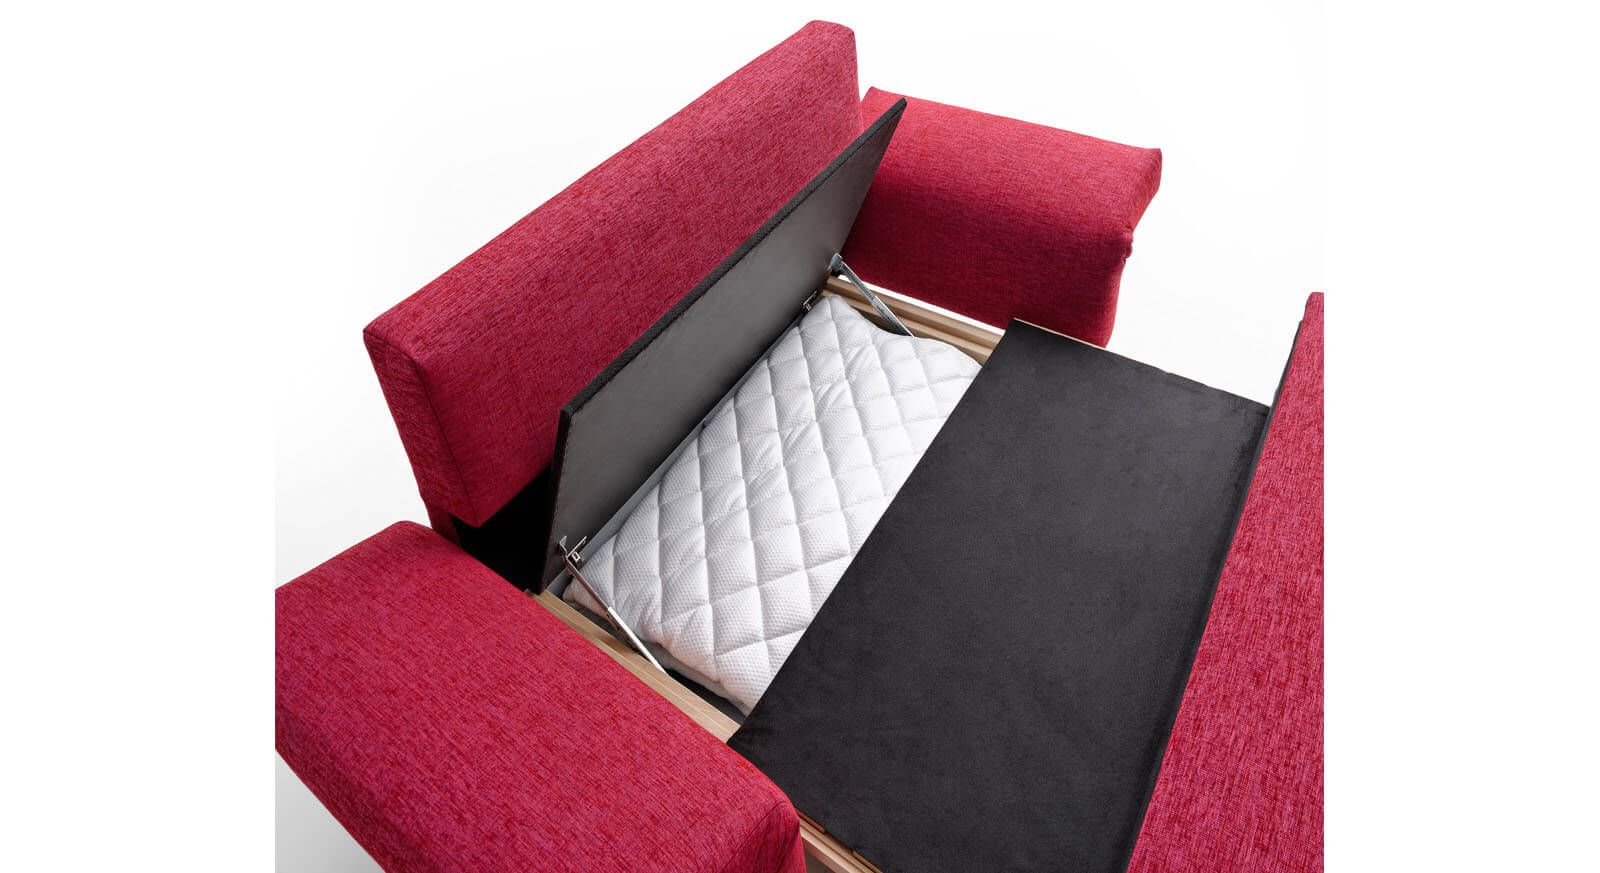 Malou: Malou Sofa Bed